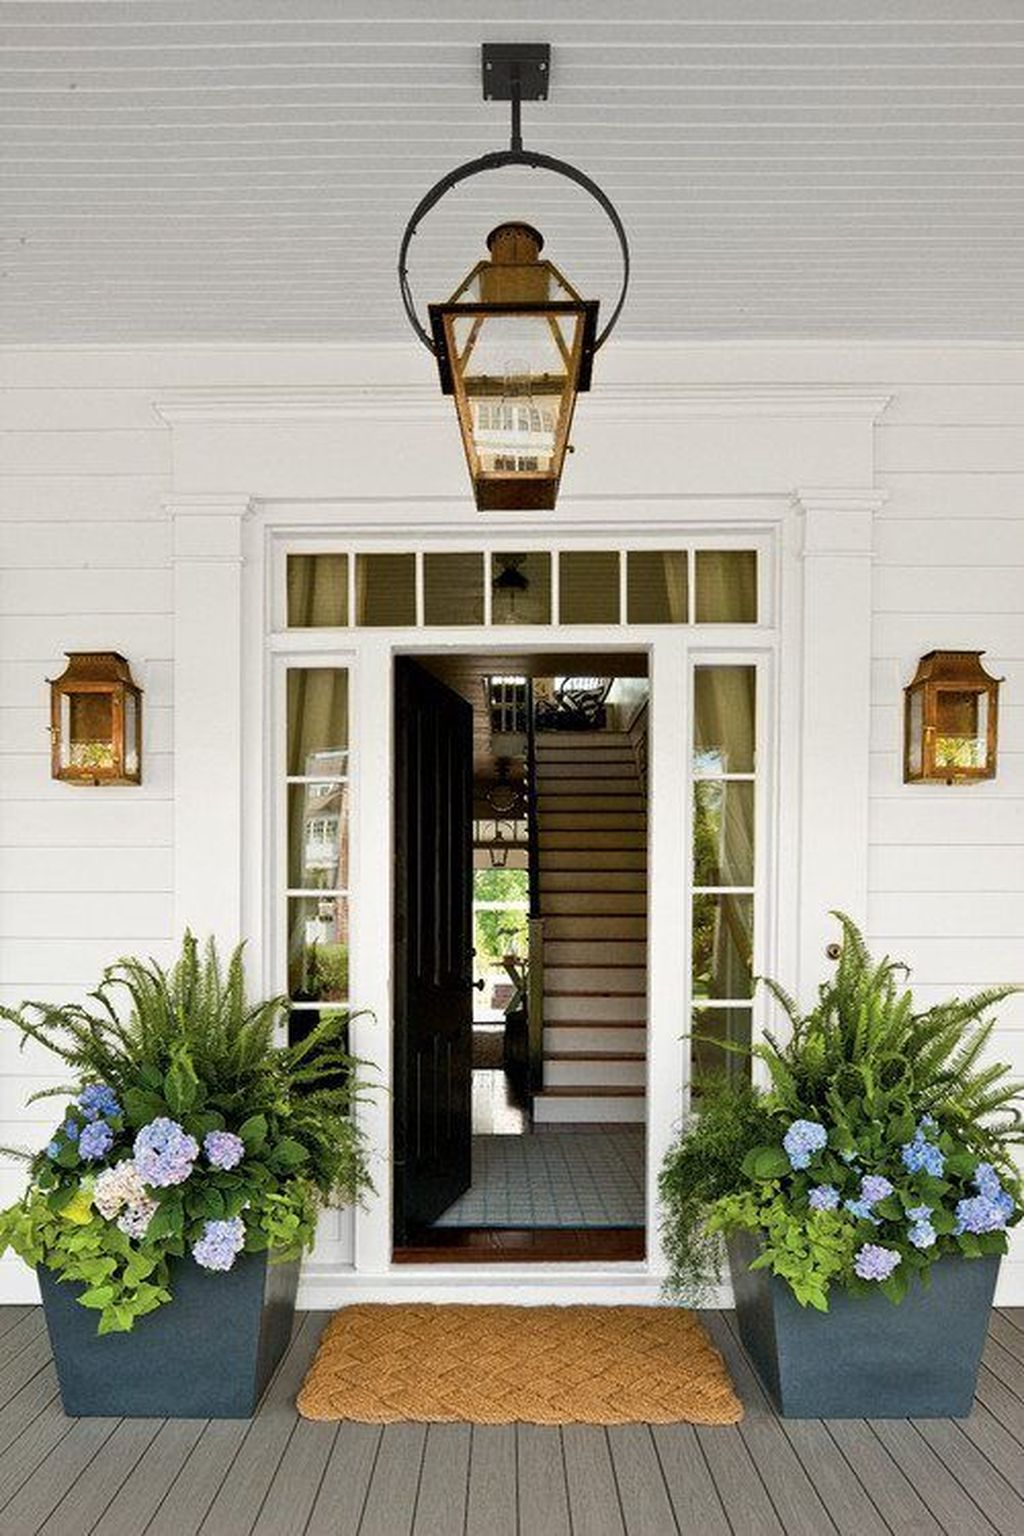 Beautiful Summer Planters Ideas For Front Door Decor 11 1